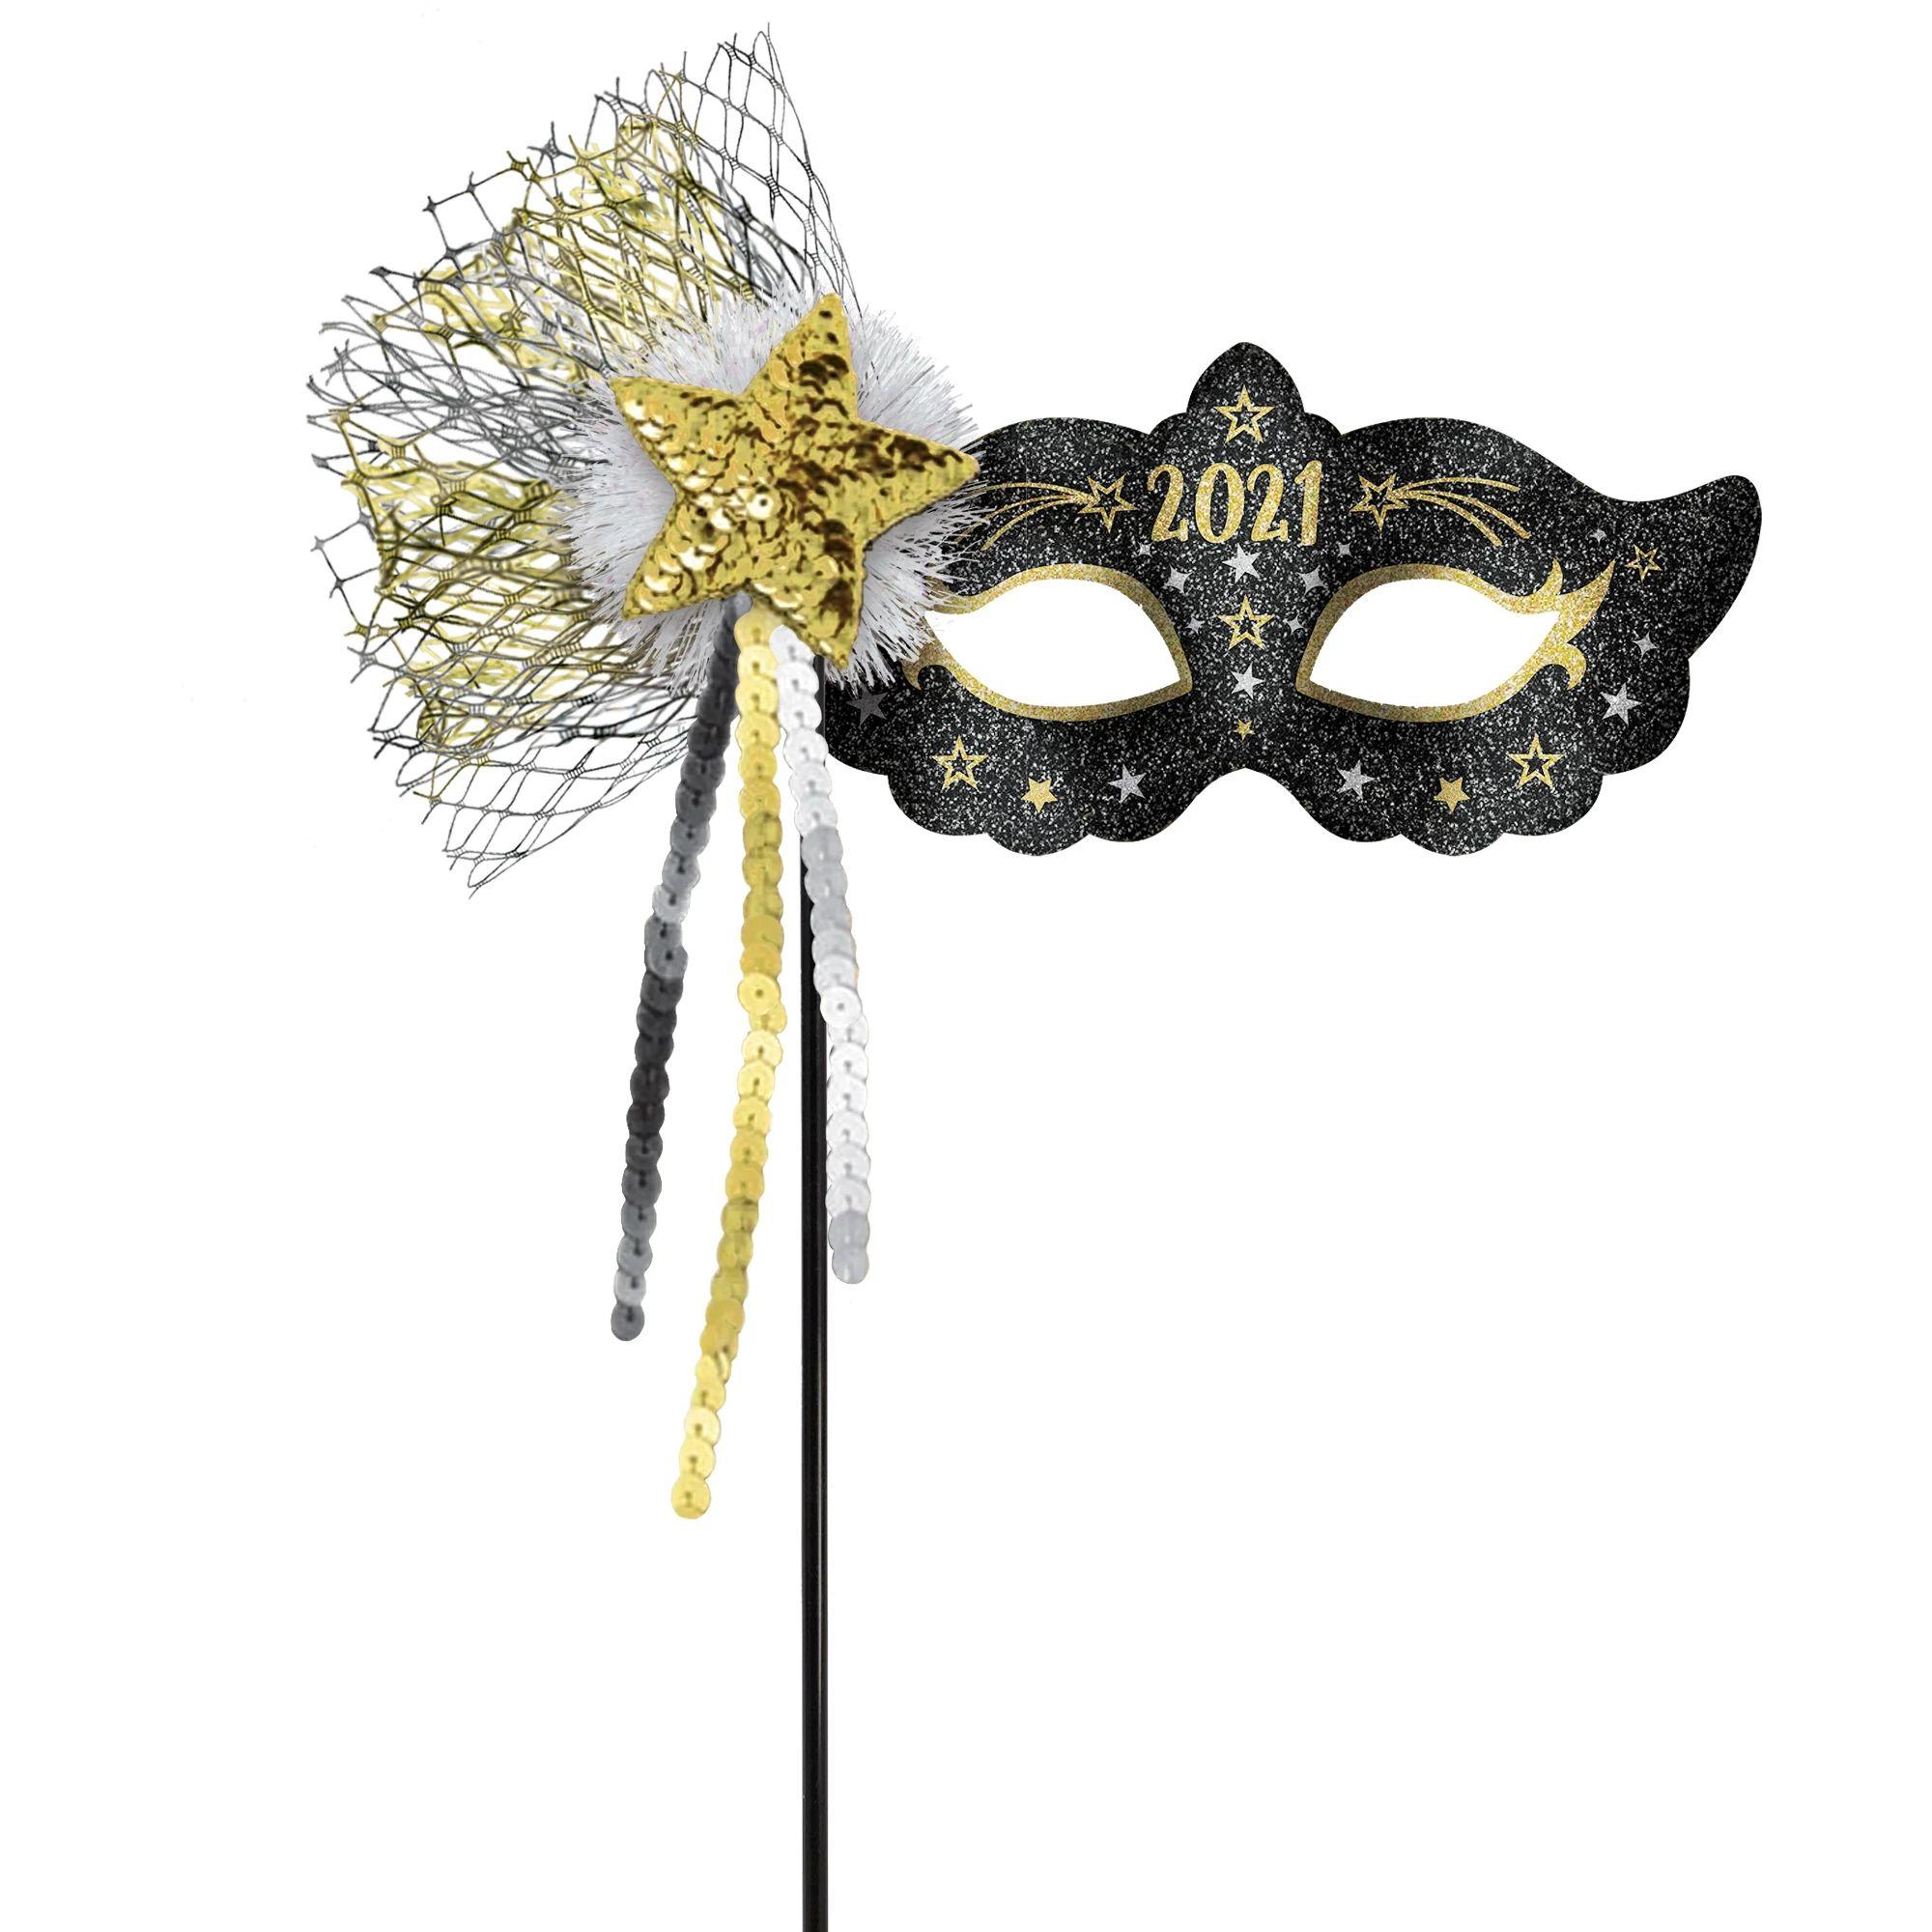 2021 Mask On A Stick